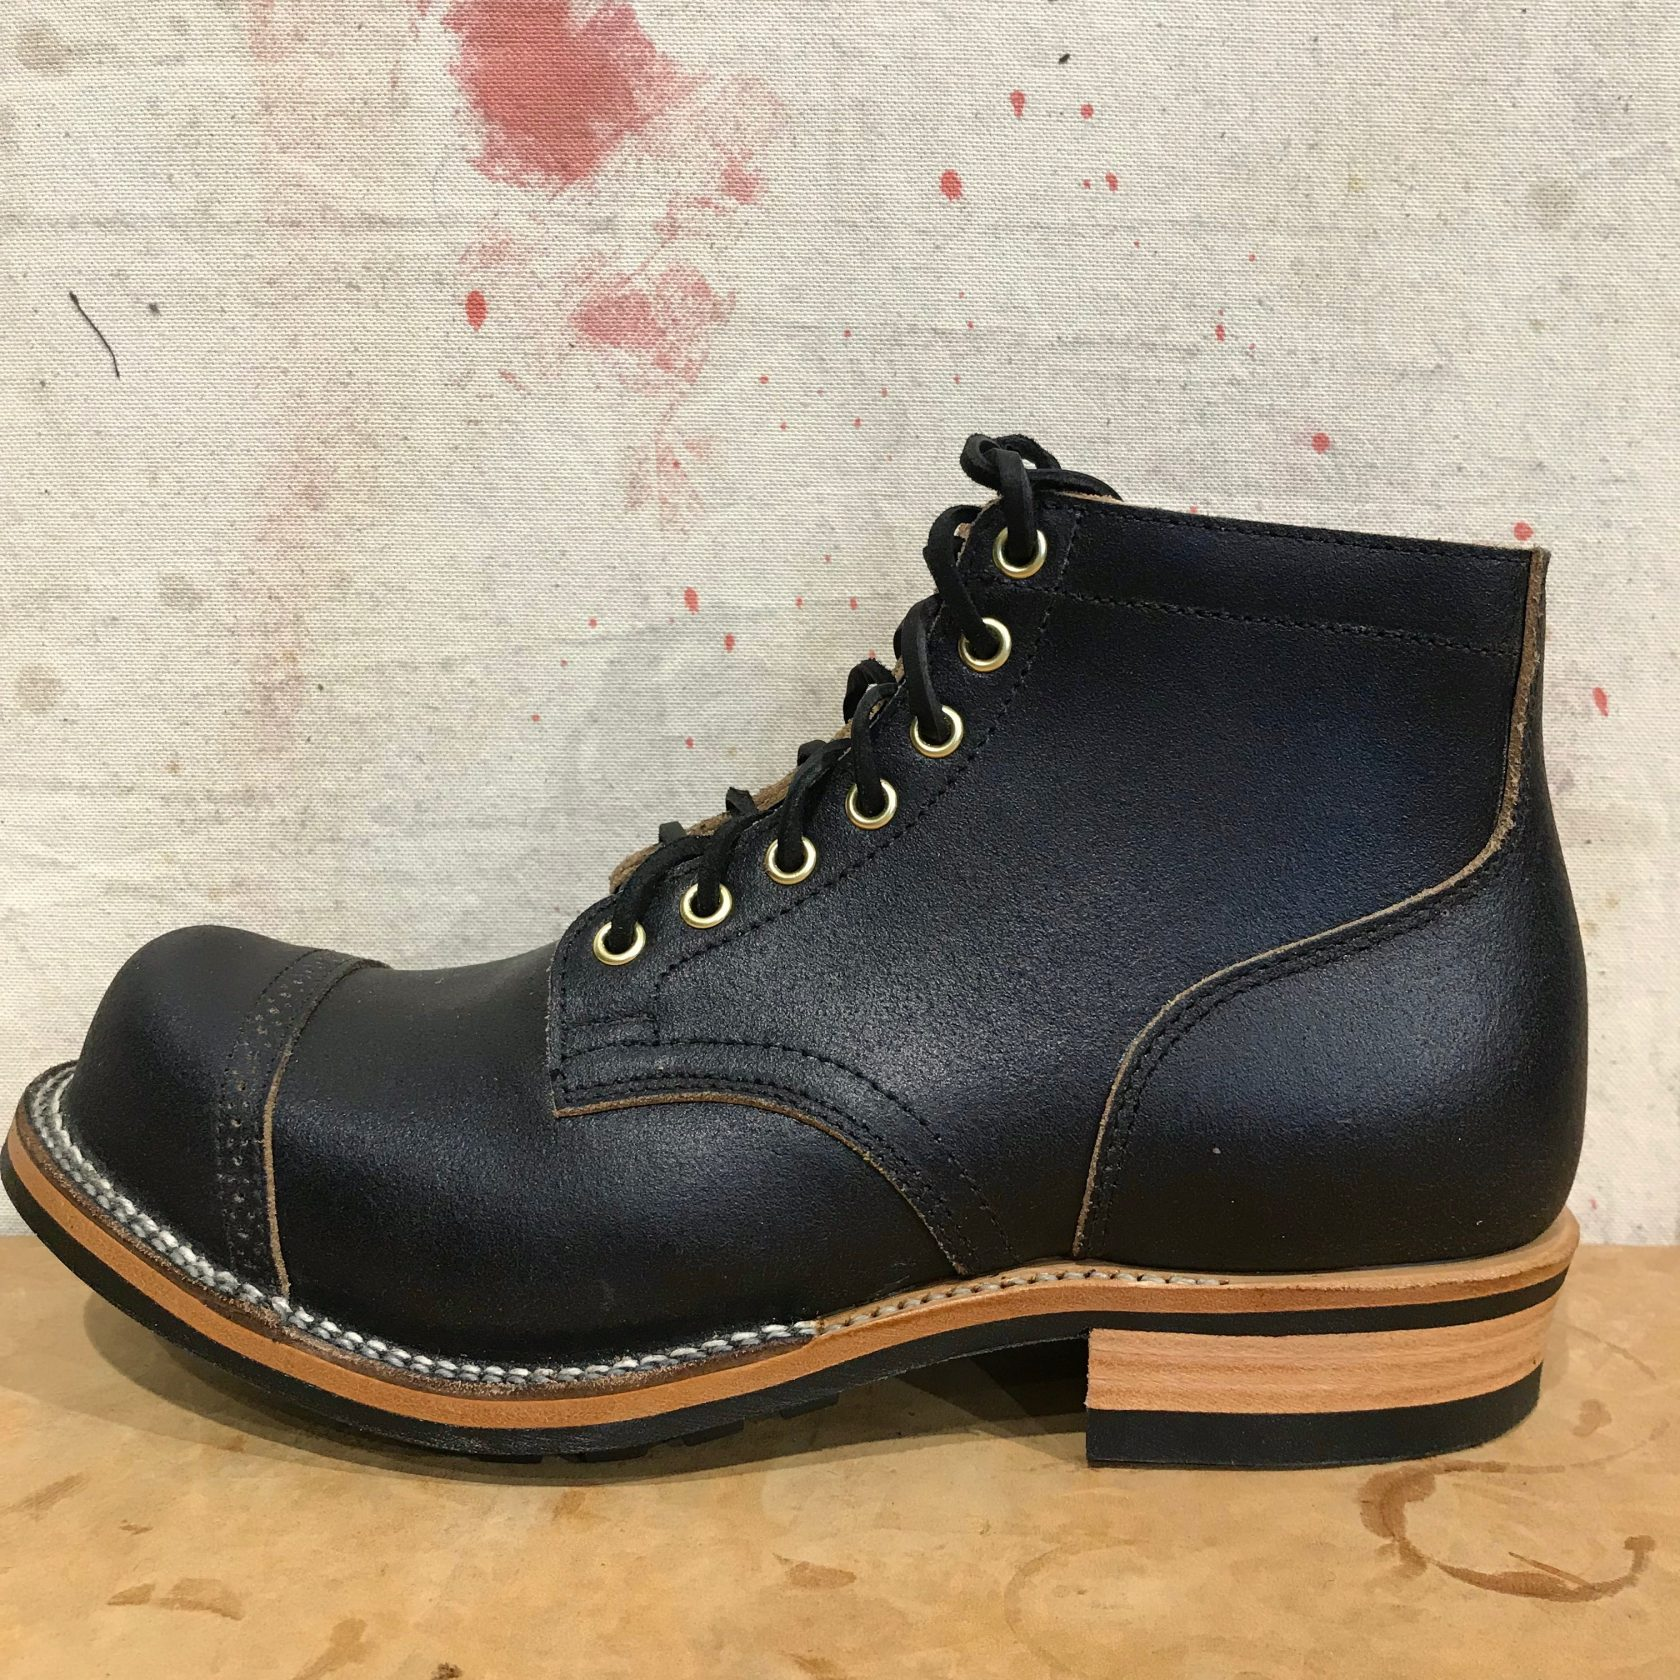 Viberg Service Boot black waxed flesh